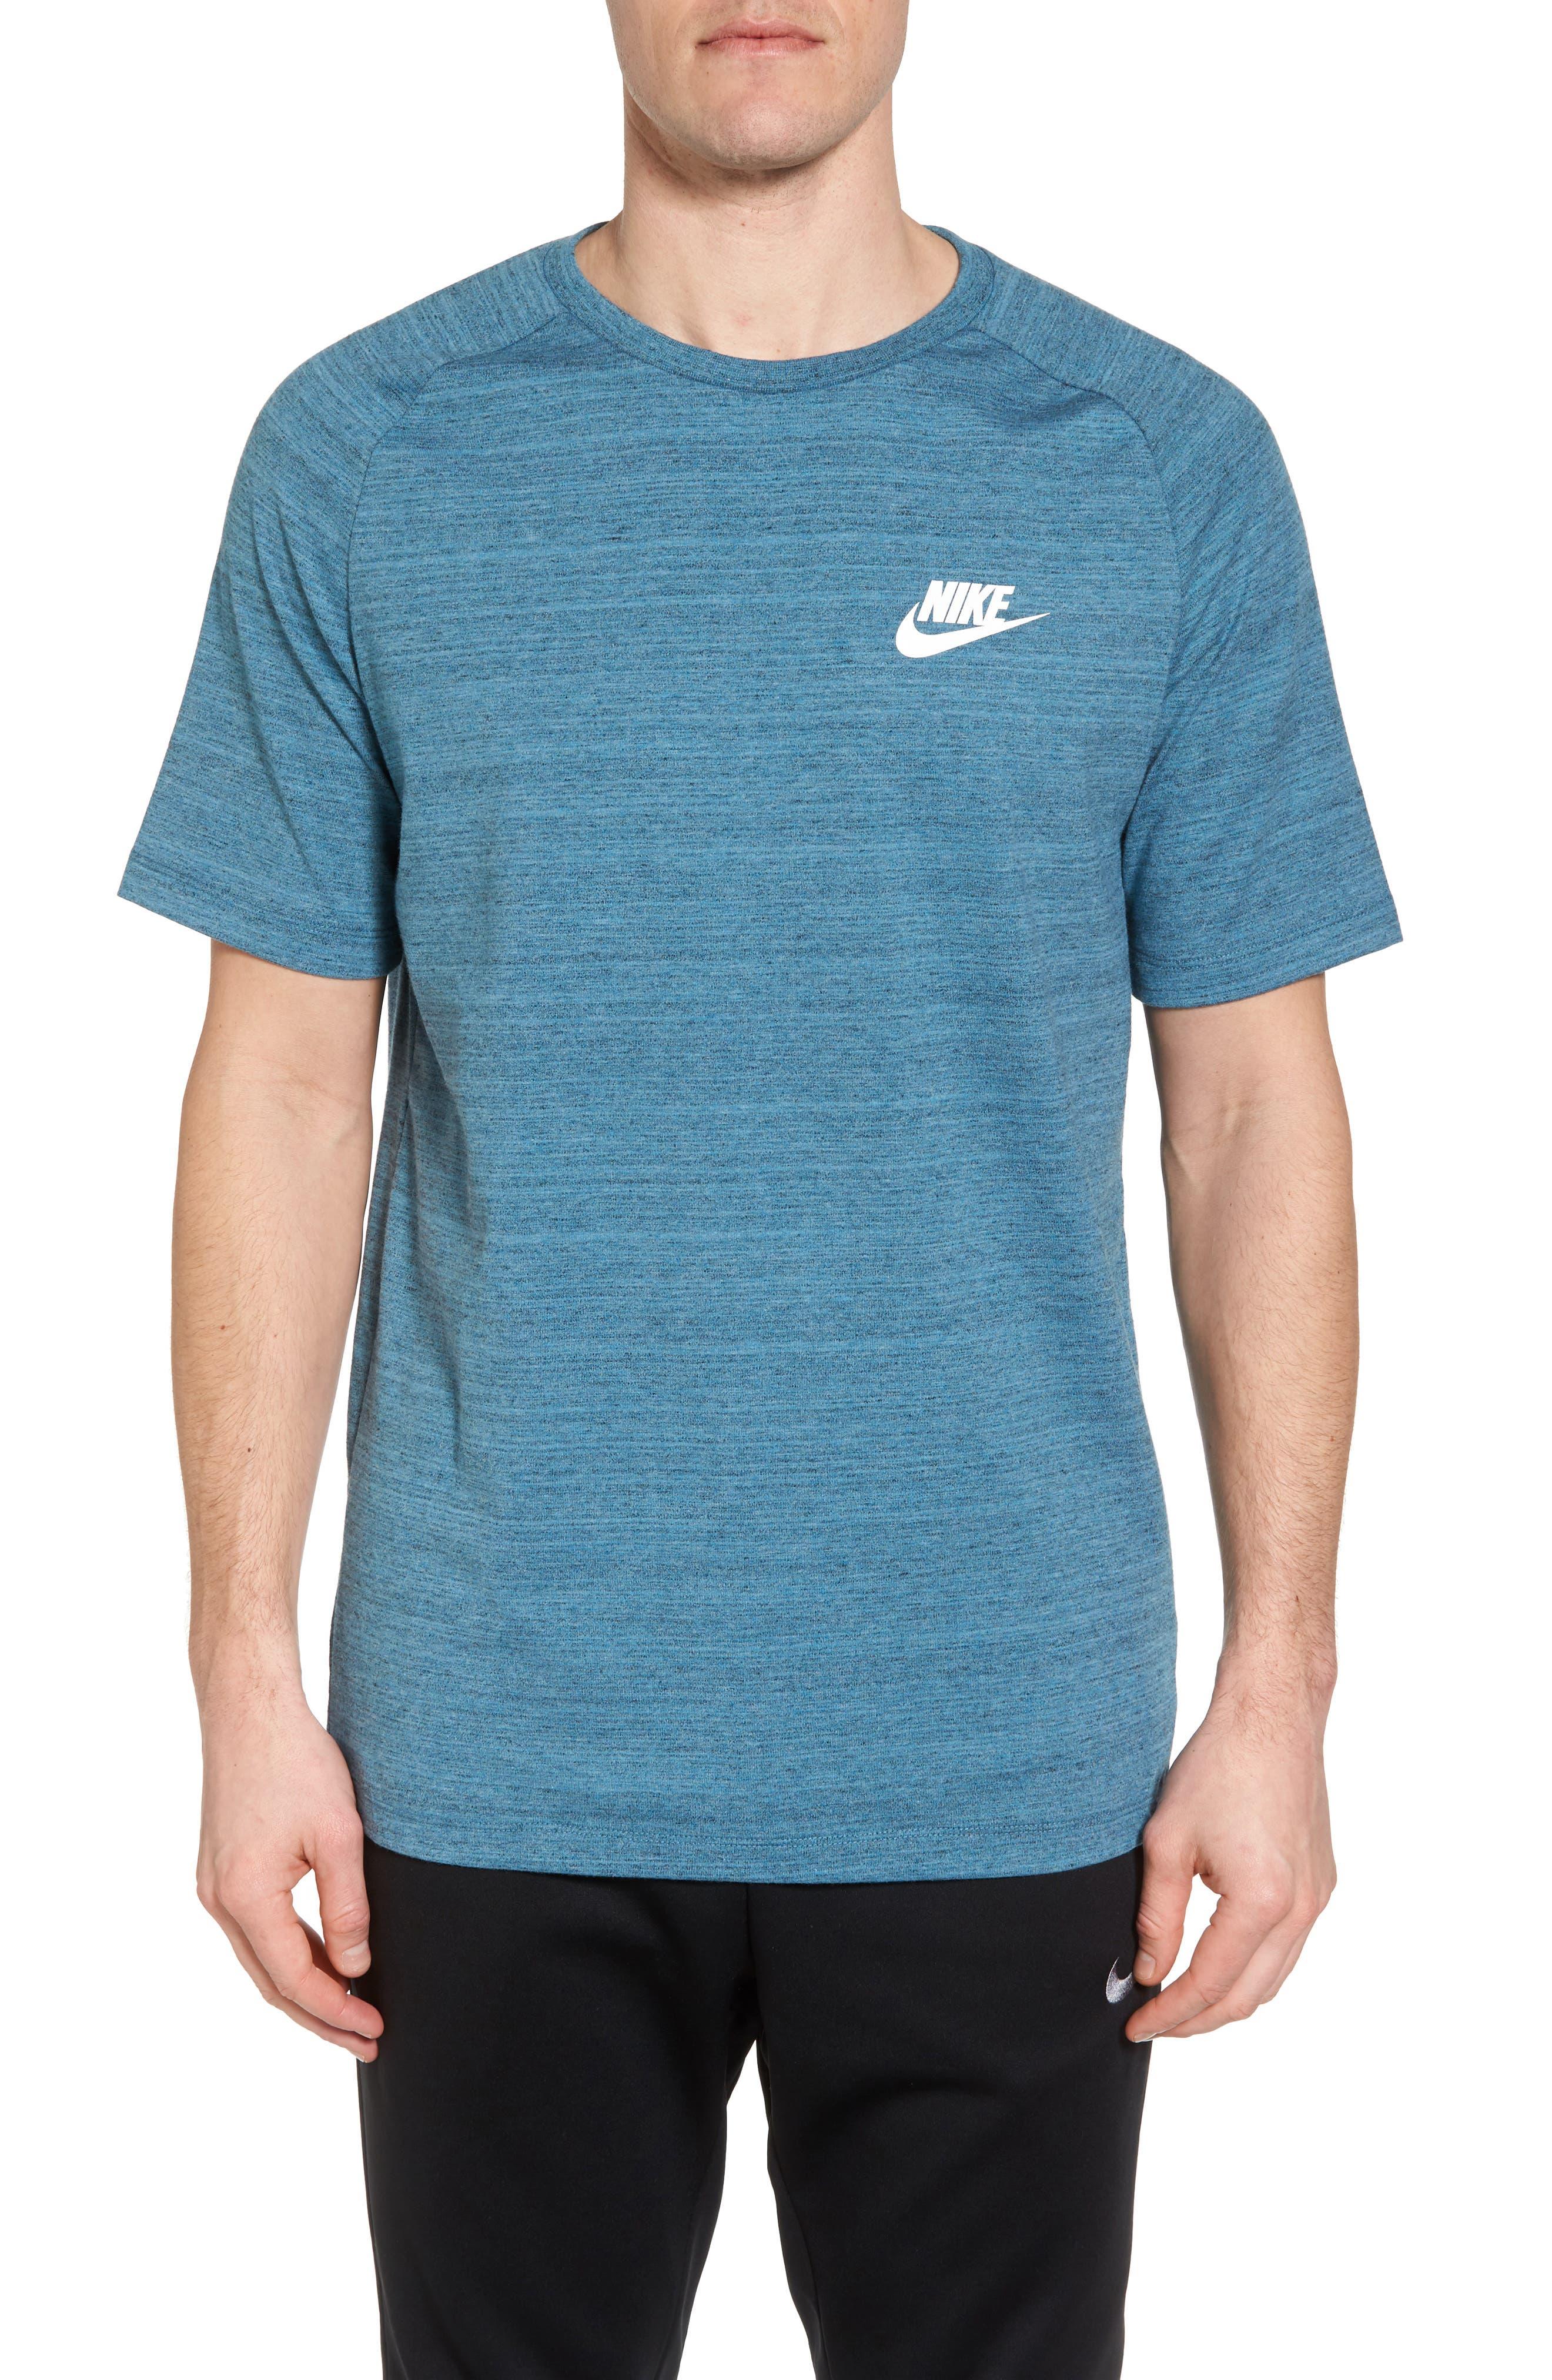 NSW AV15 Crewneck T-Shirt,                             Main thumbnail 1, color,                             NOISE AQUA/ HEATHER/ WHITE